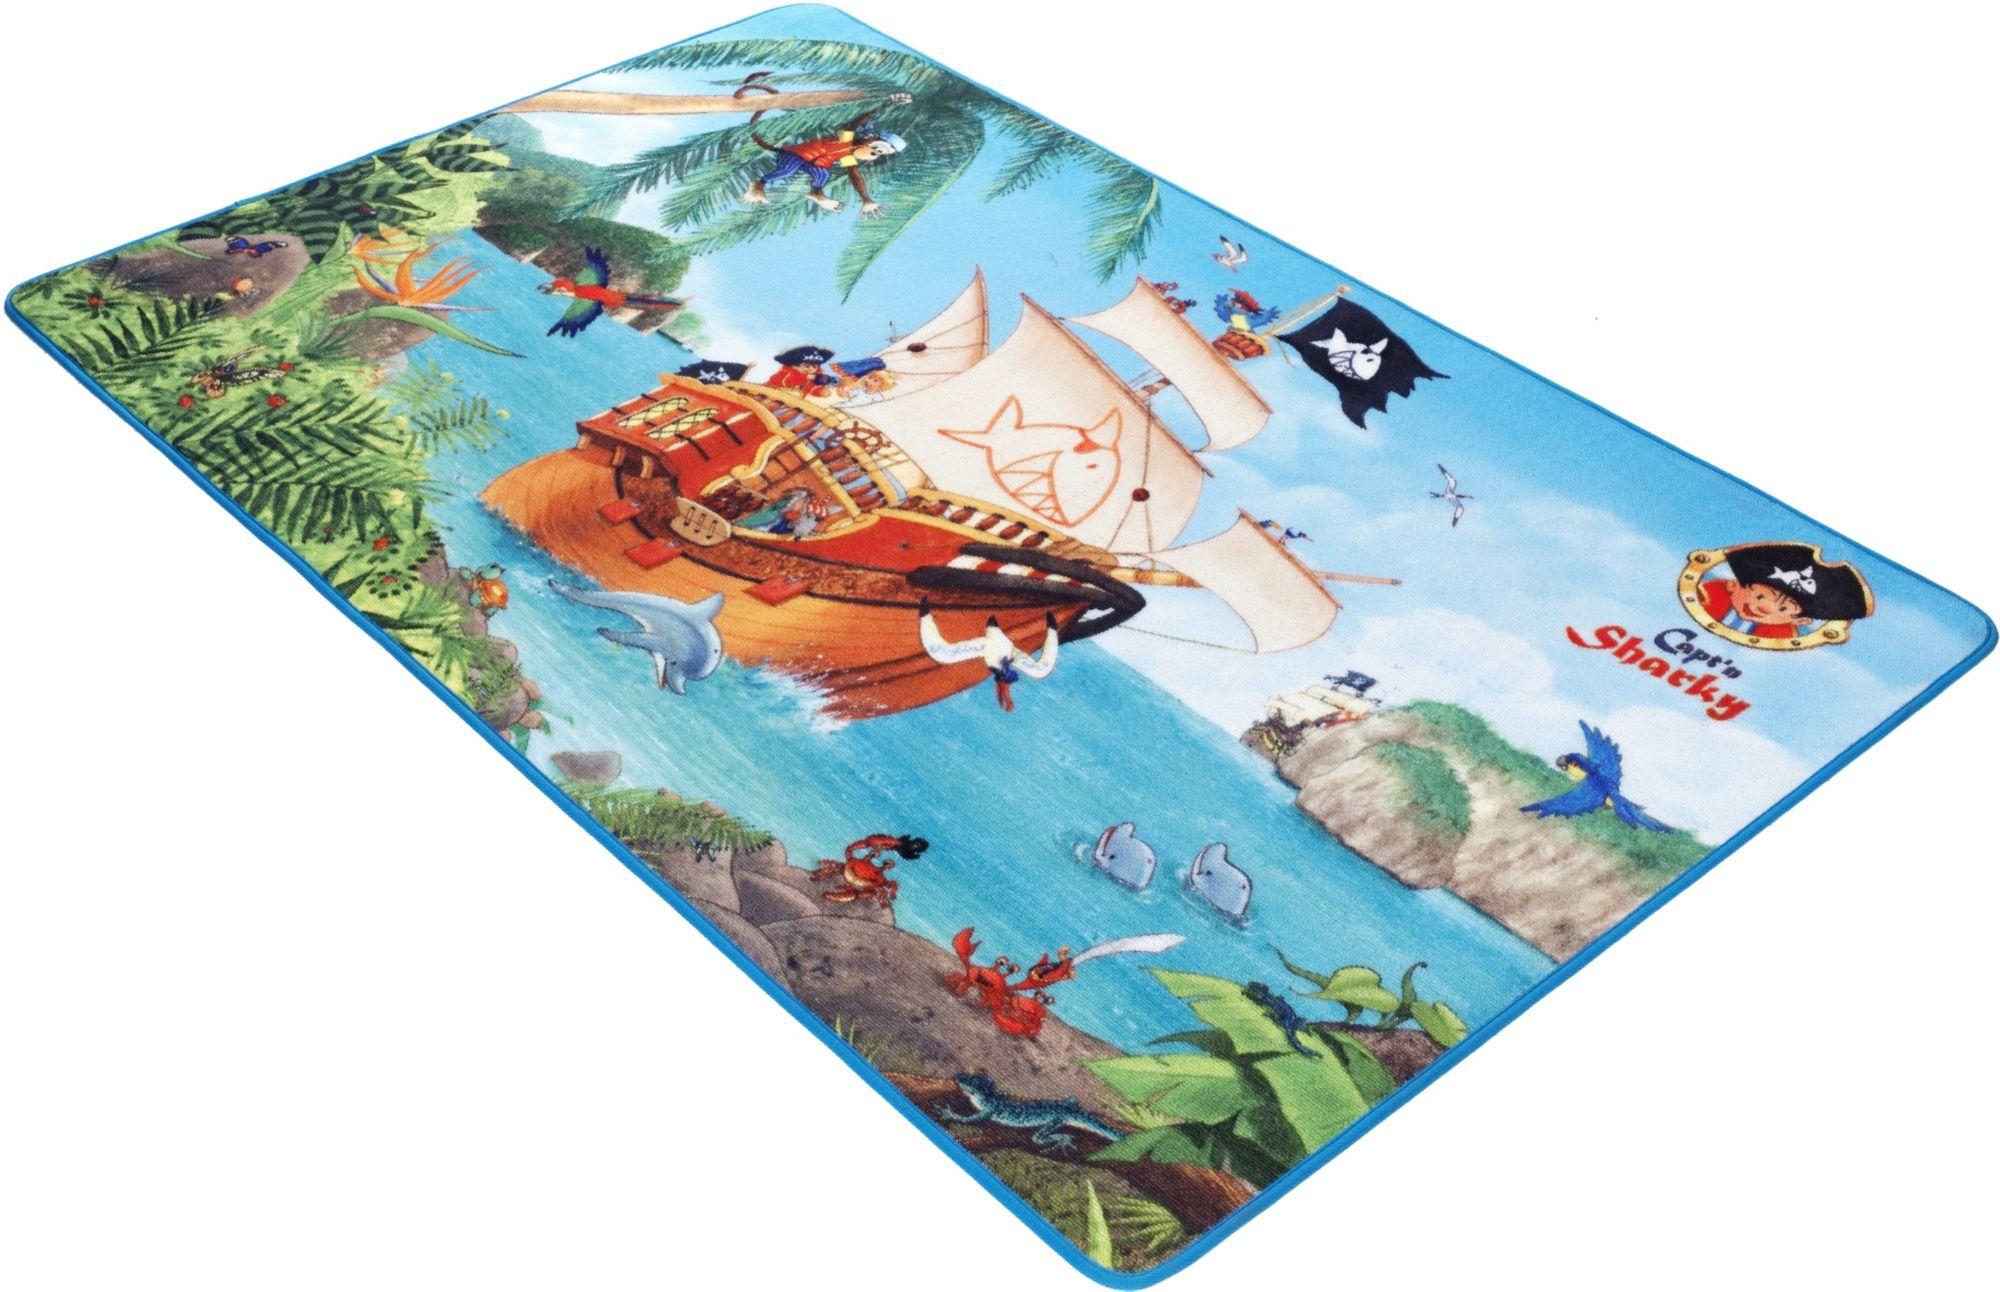 CAPTN SHARKY Kinder-Teppich, Capt'n Sharky, »SH-301«